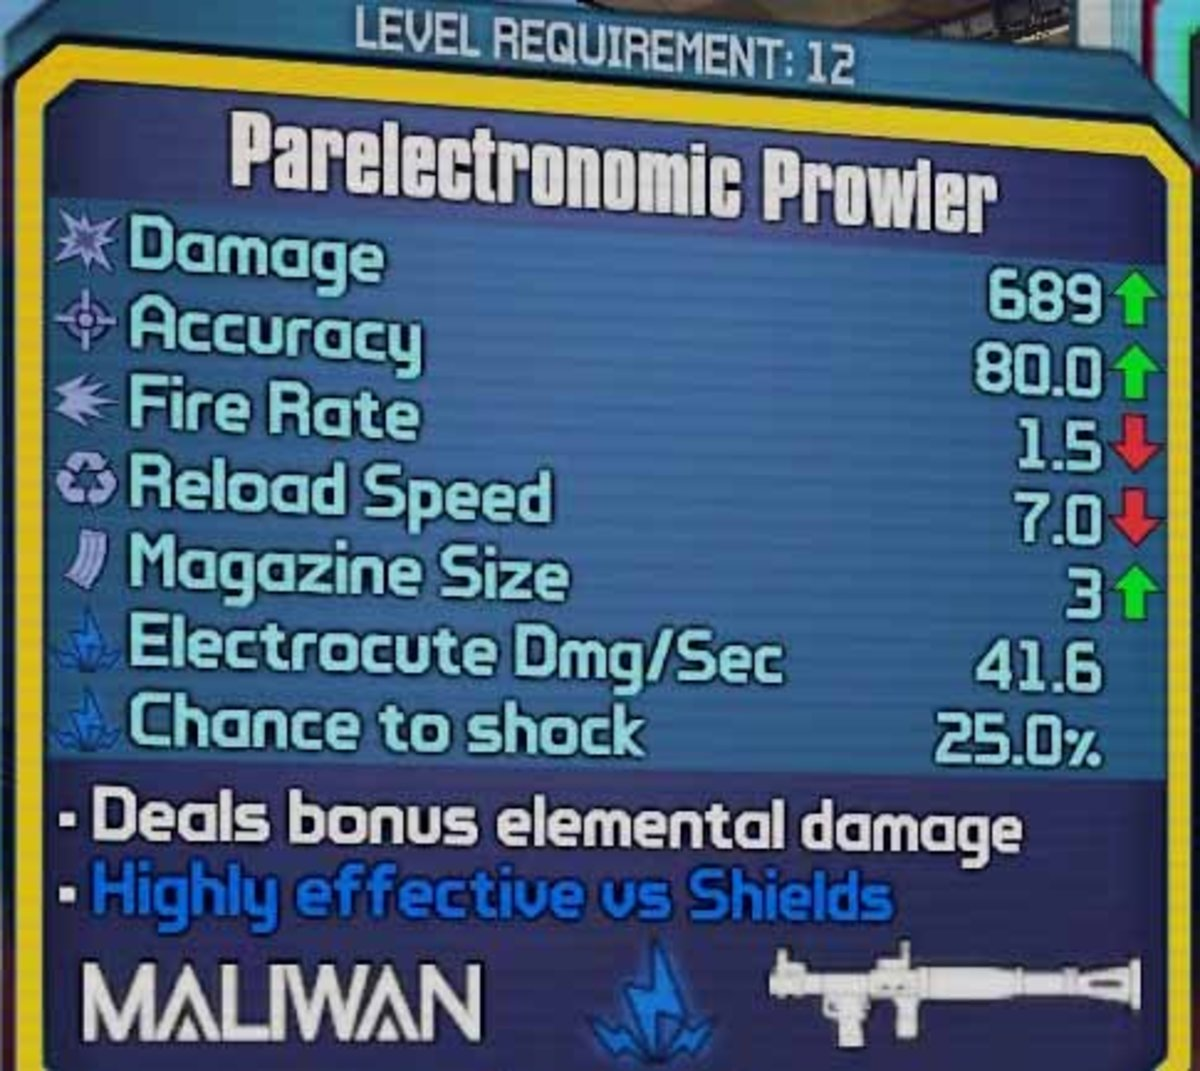 Borderlands 2 Parelectronomic Prowler